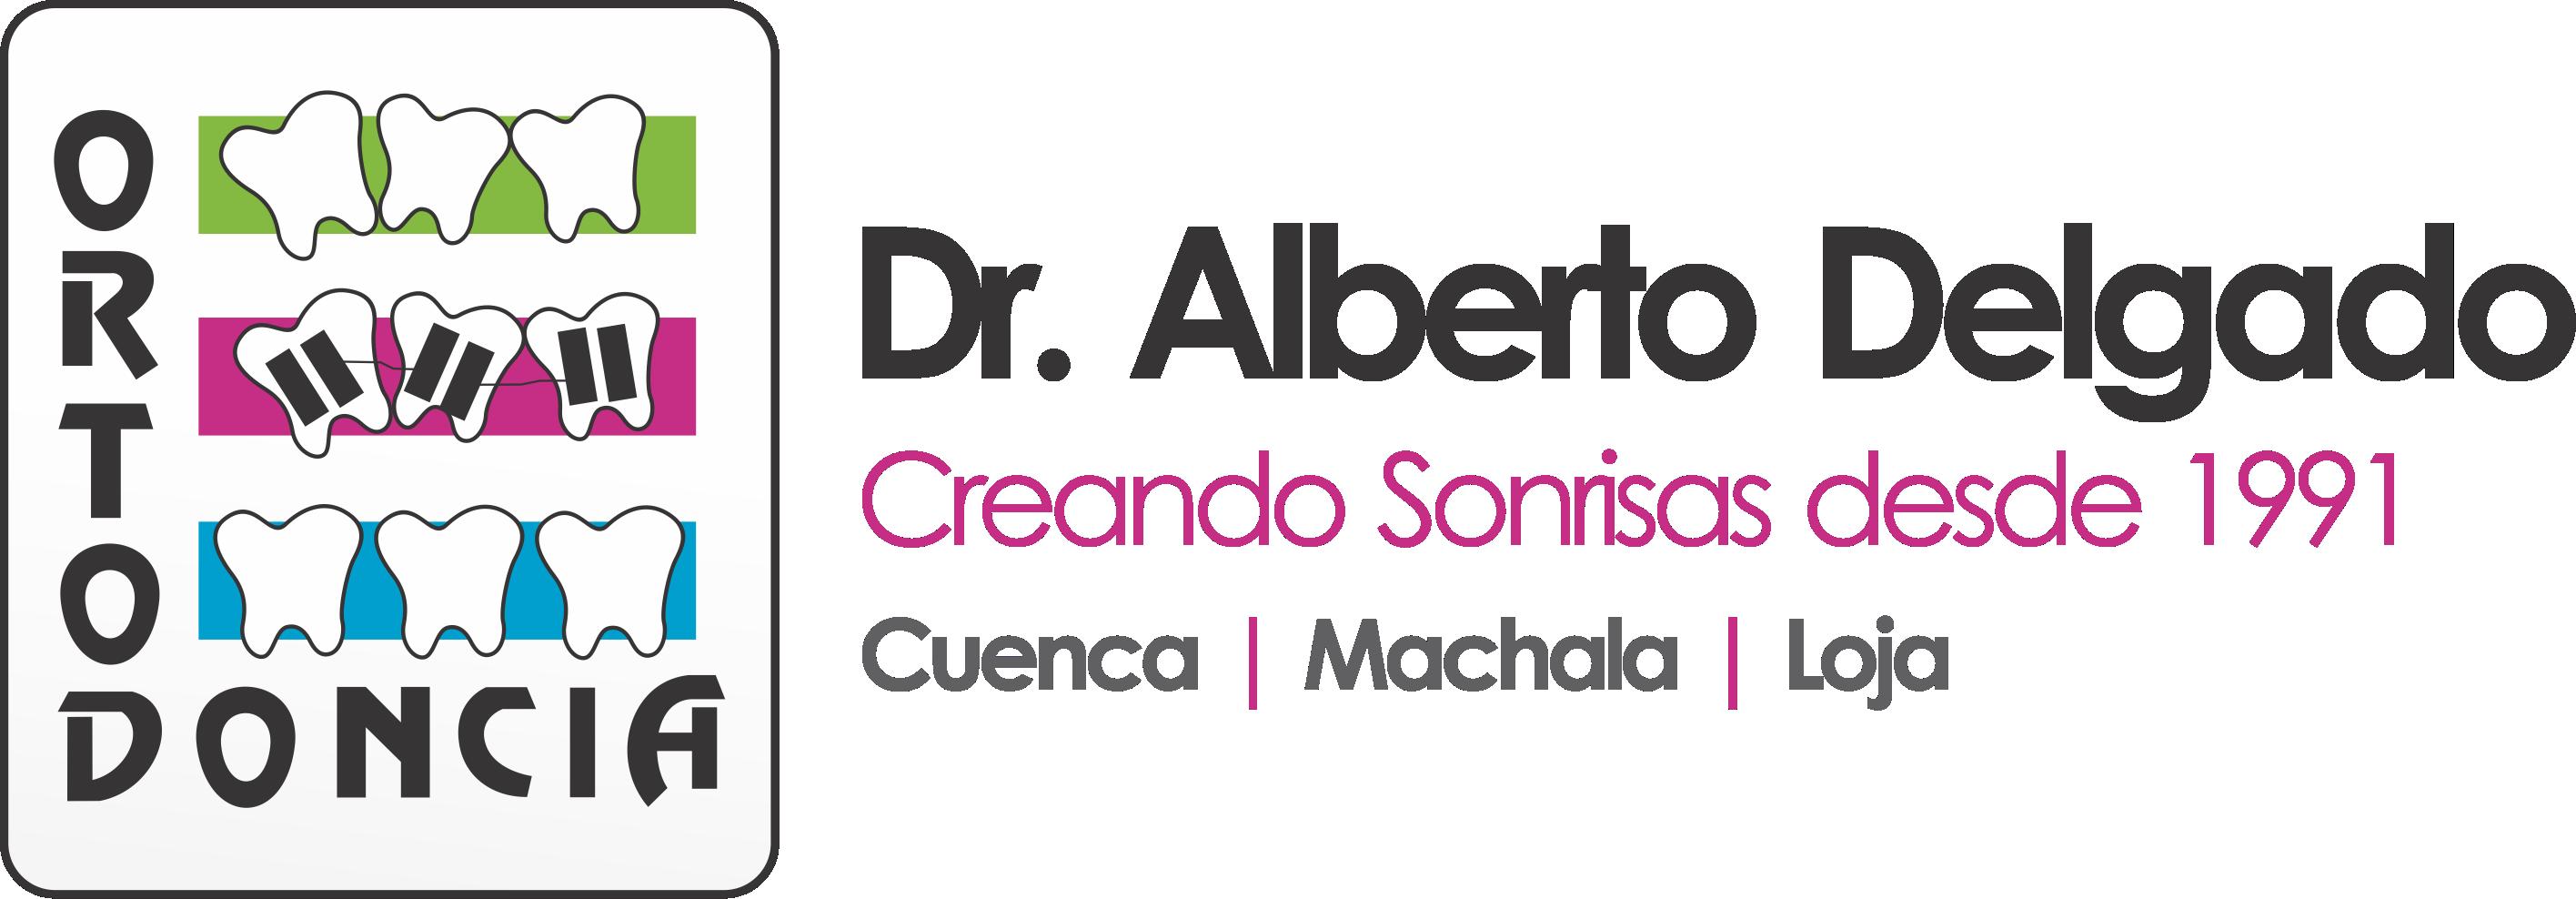 Ortodoncia Ecuador (Dr.  Alberto Delgado)